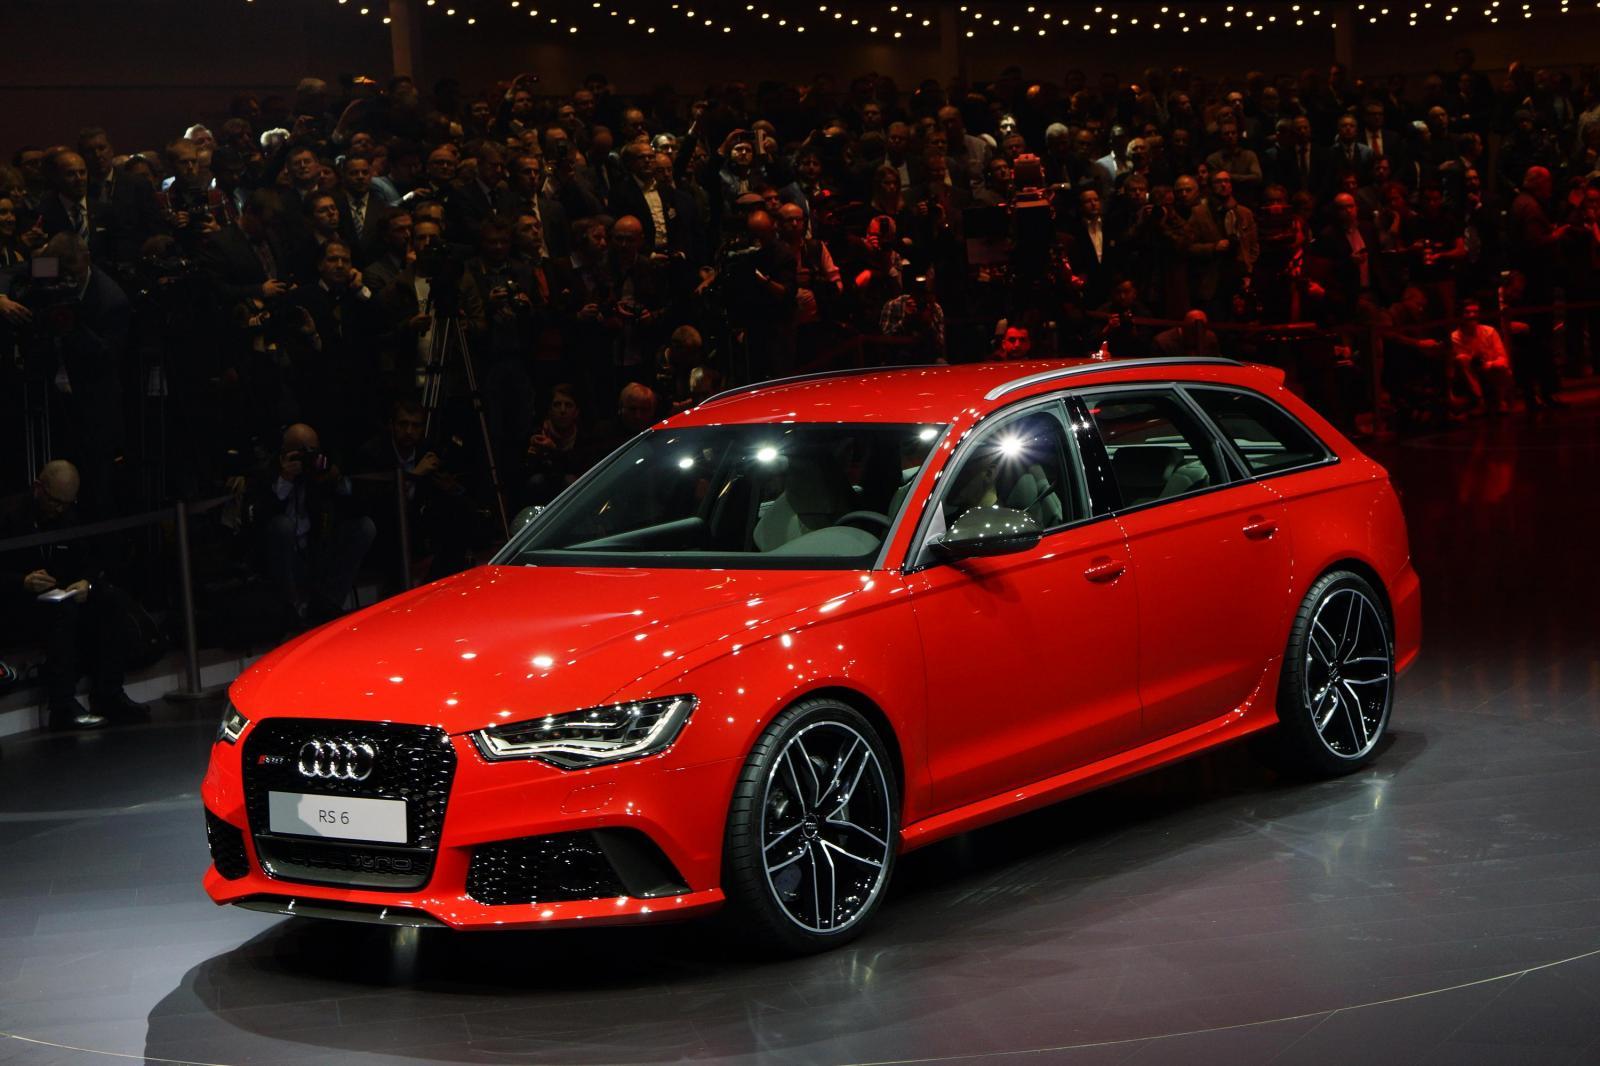 2014 Audi Rs6 Avant At Geneva Gallery Rs246 Com